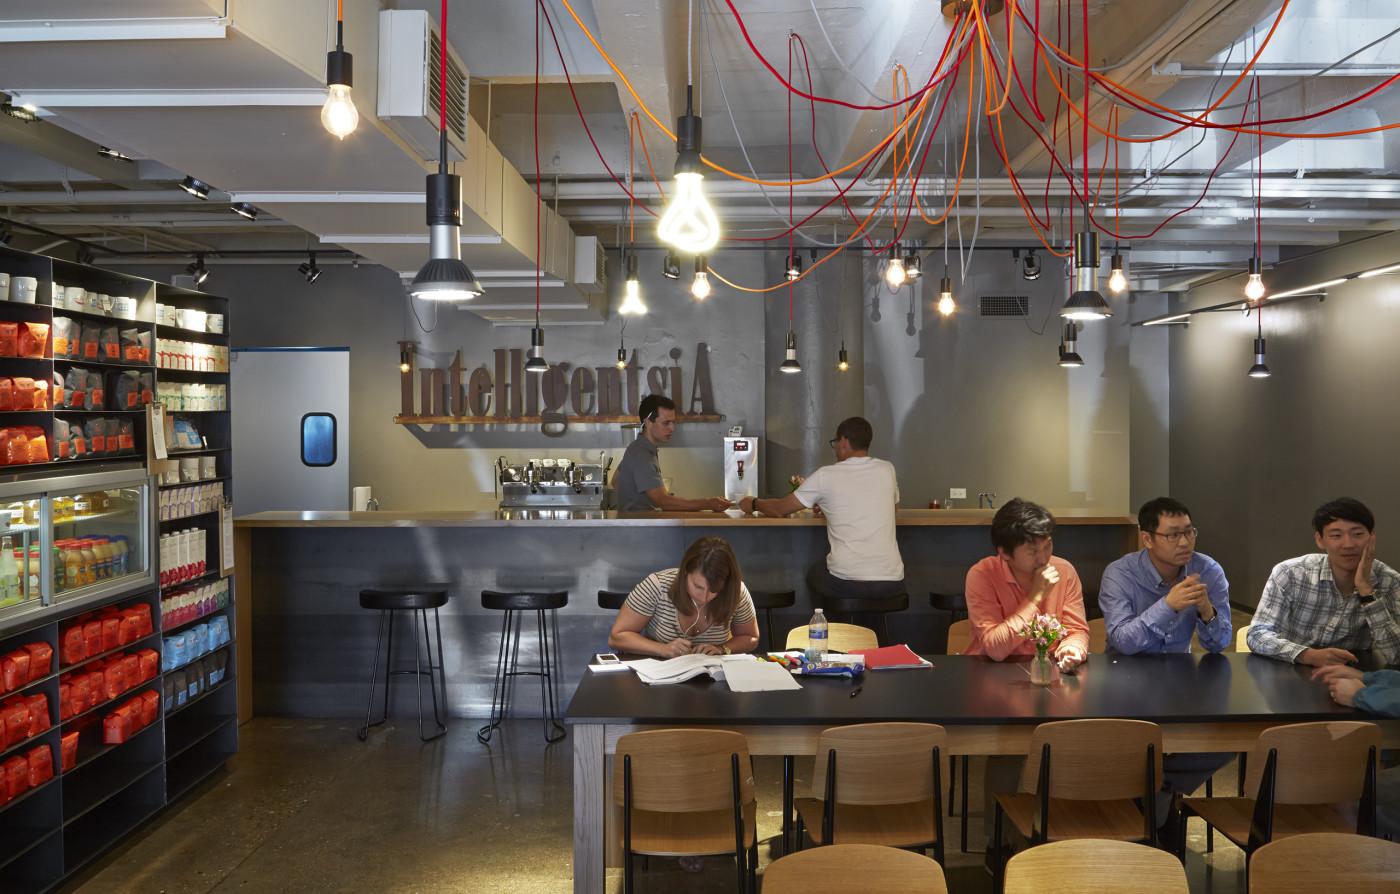 Industrial decor lines the interior of Intelligentsia Coffee Shop, Lake View. Photo Courtesy of Intelligentsia.